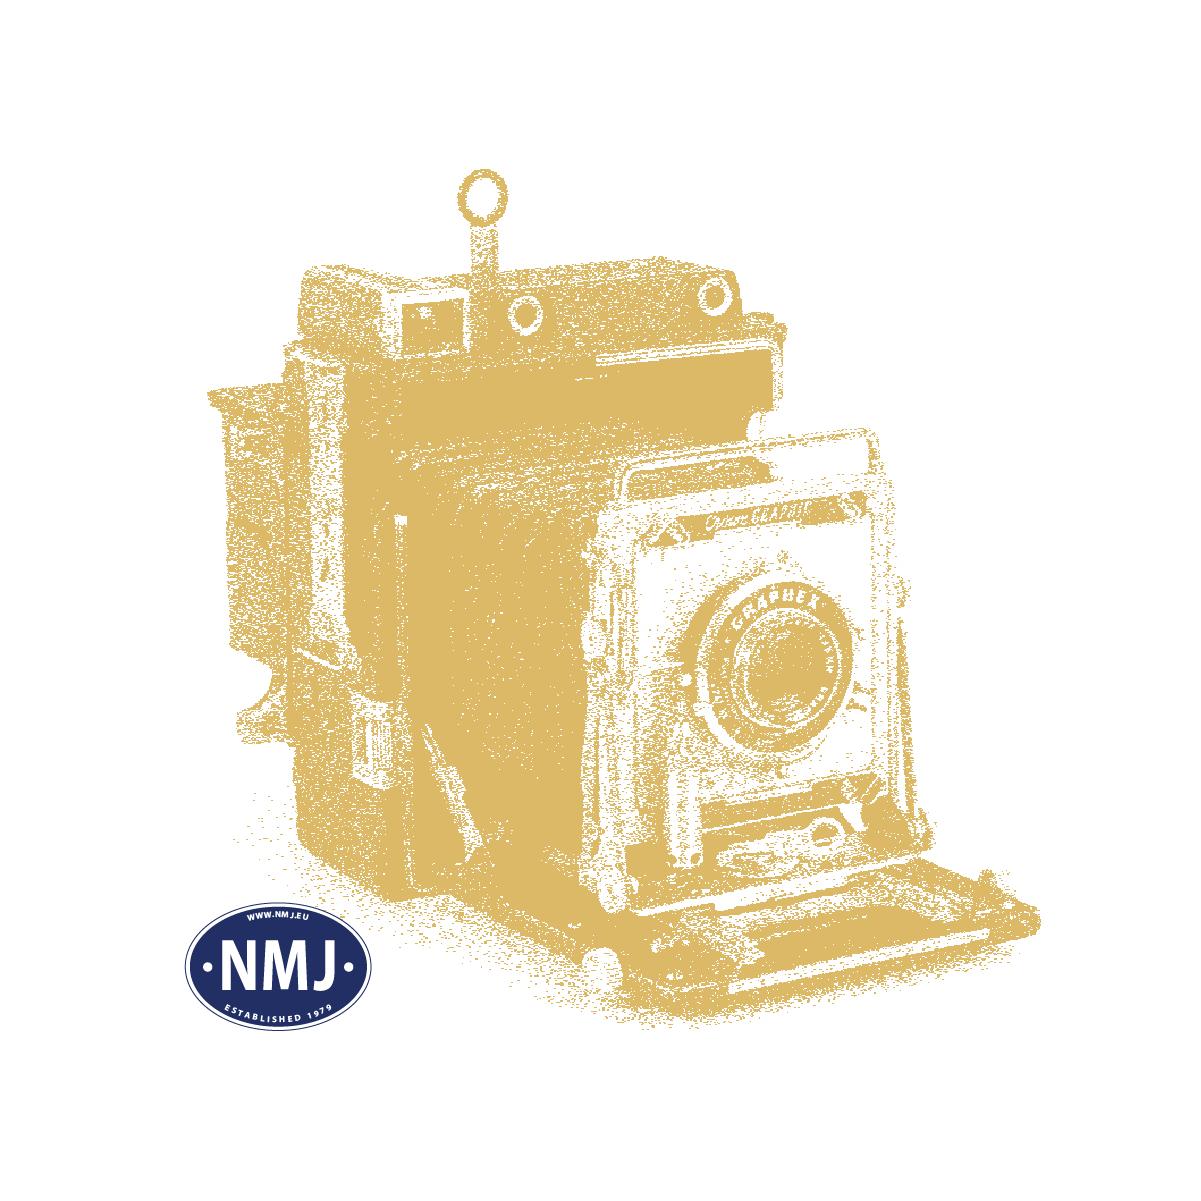 "NMJT610.301 - NMJ Topline SJ Ibblps 820 0 374-0 ""Findus"" Interfrigo"